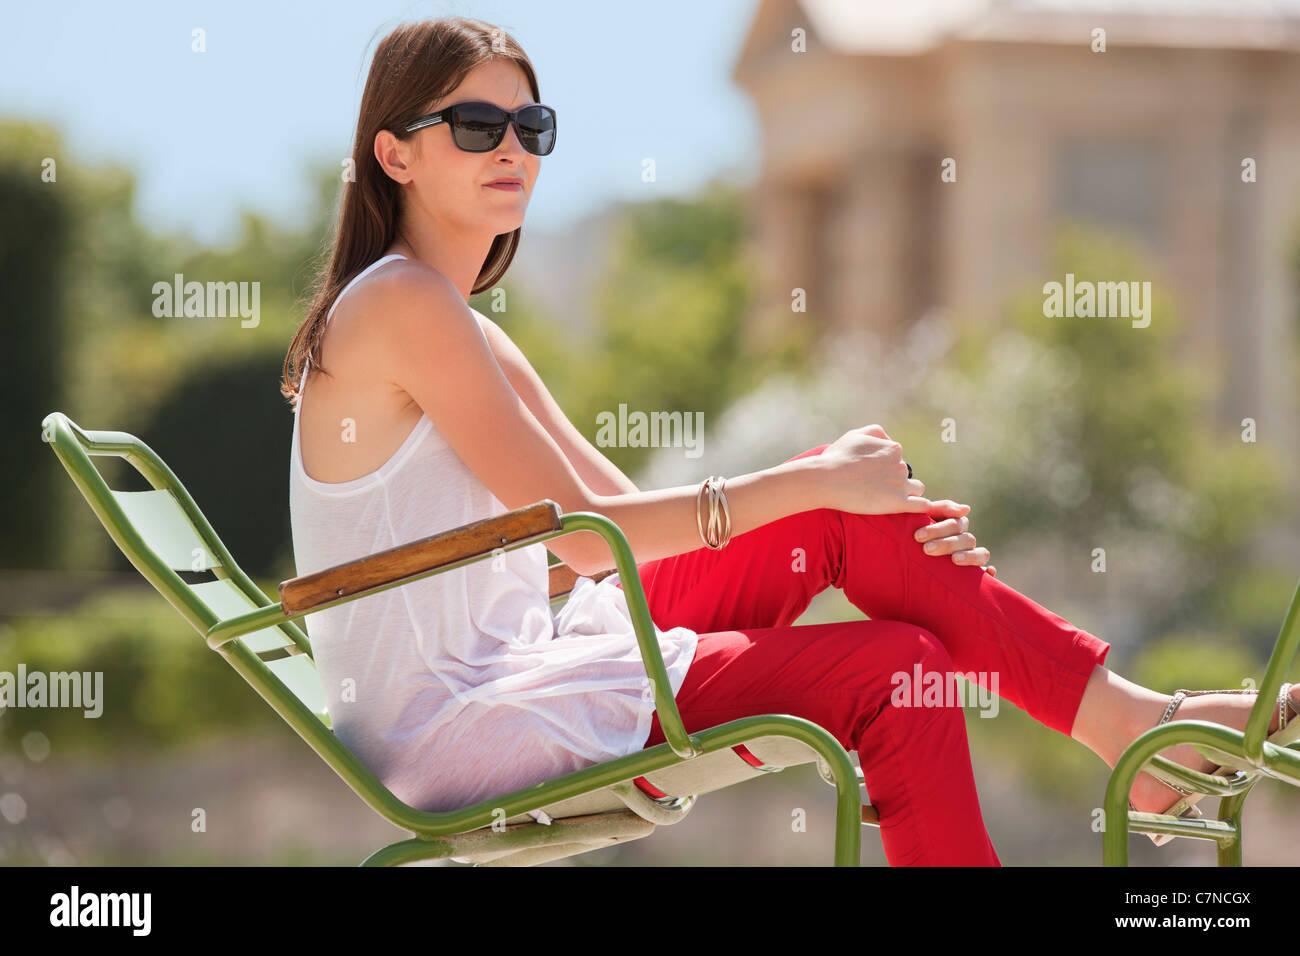 Woman sitting in a chair, Bassin octogonal, Jardin des Tuileries, Paris, Ile-de-France, France - Stock Image